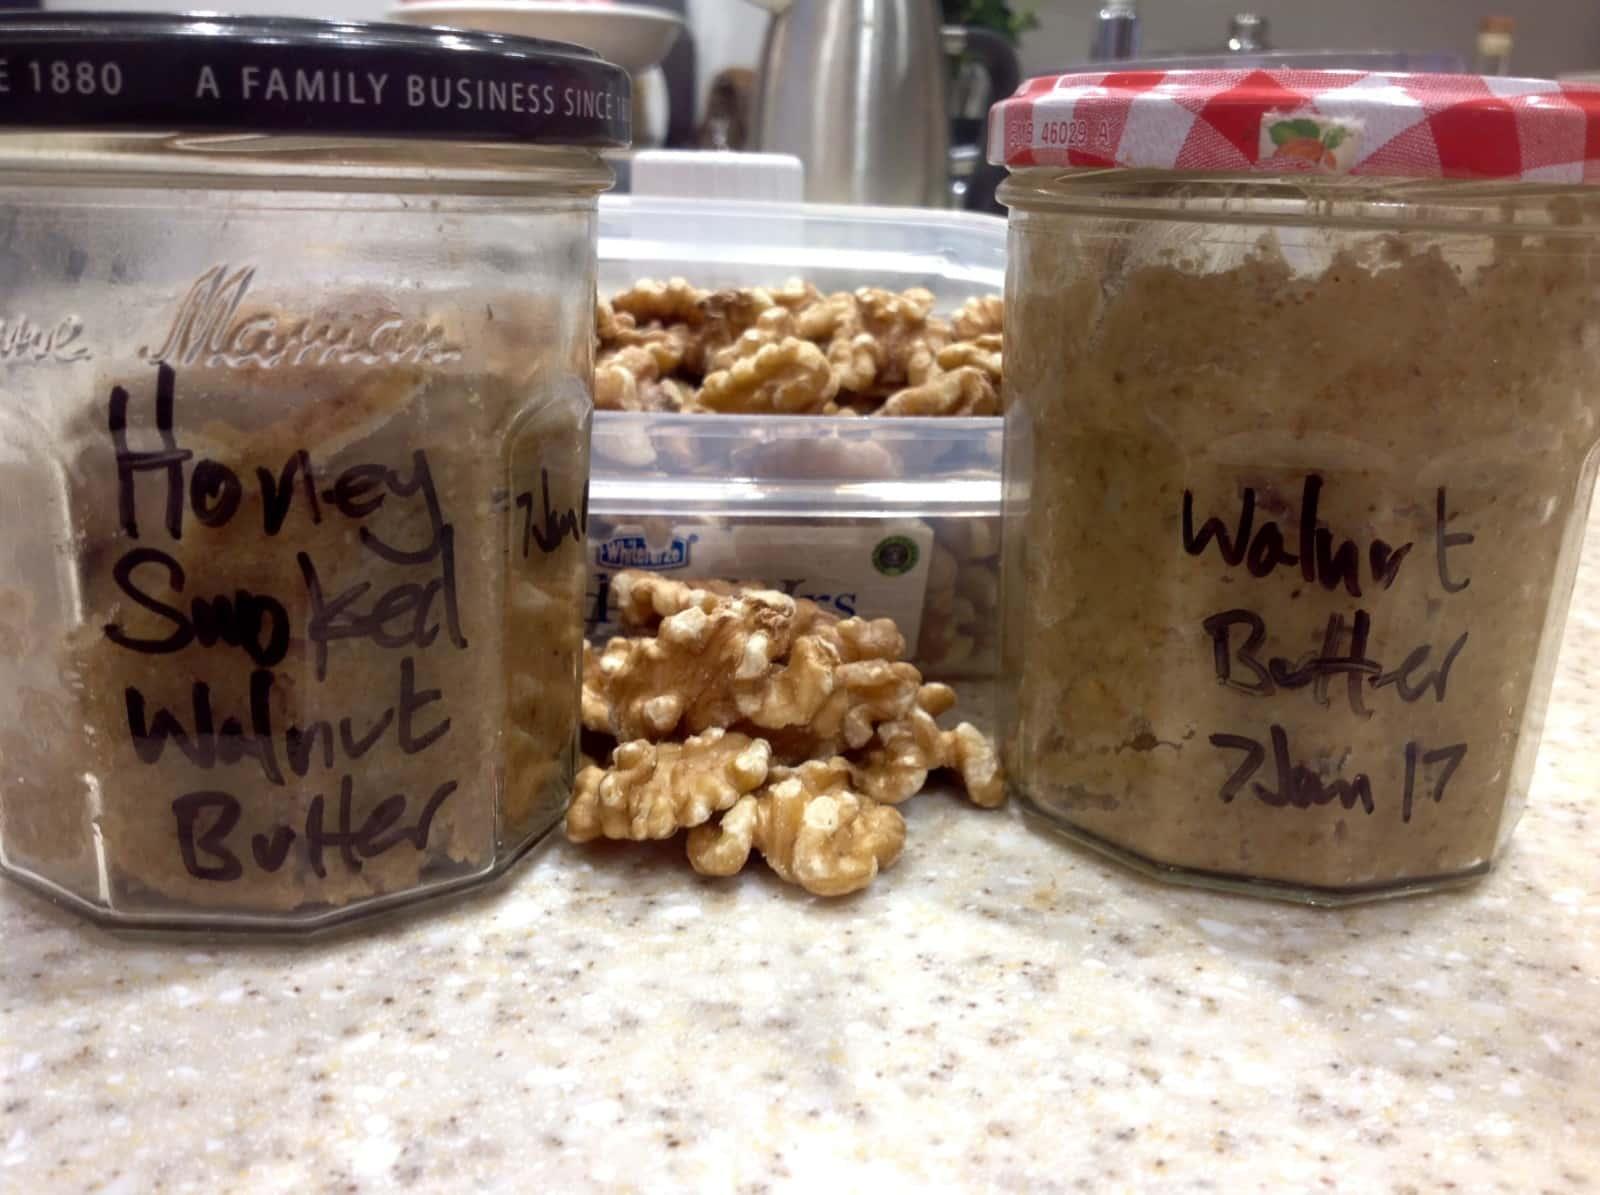 Home made honey smoked walnut butter